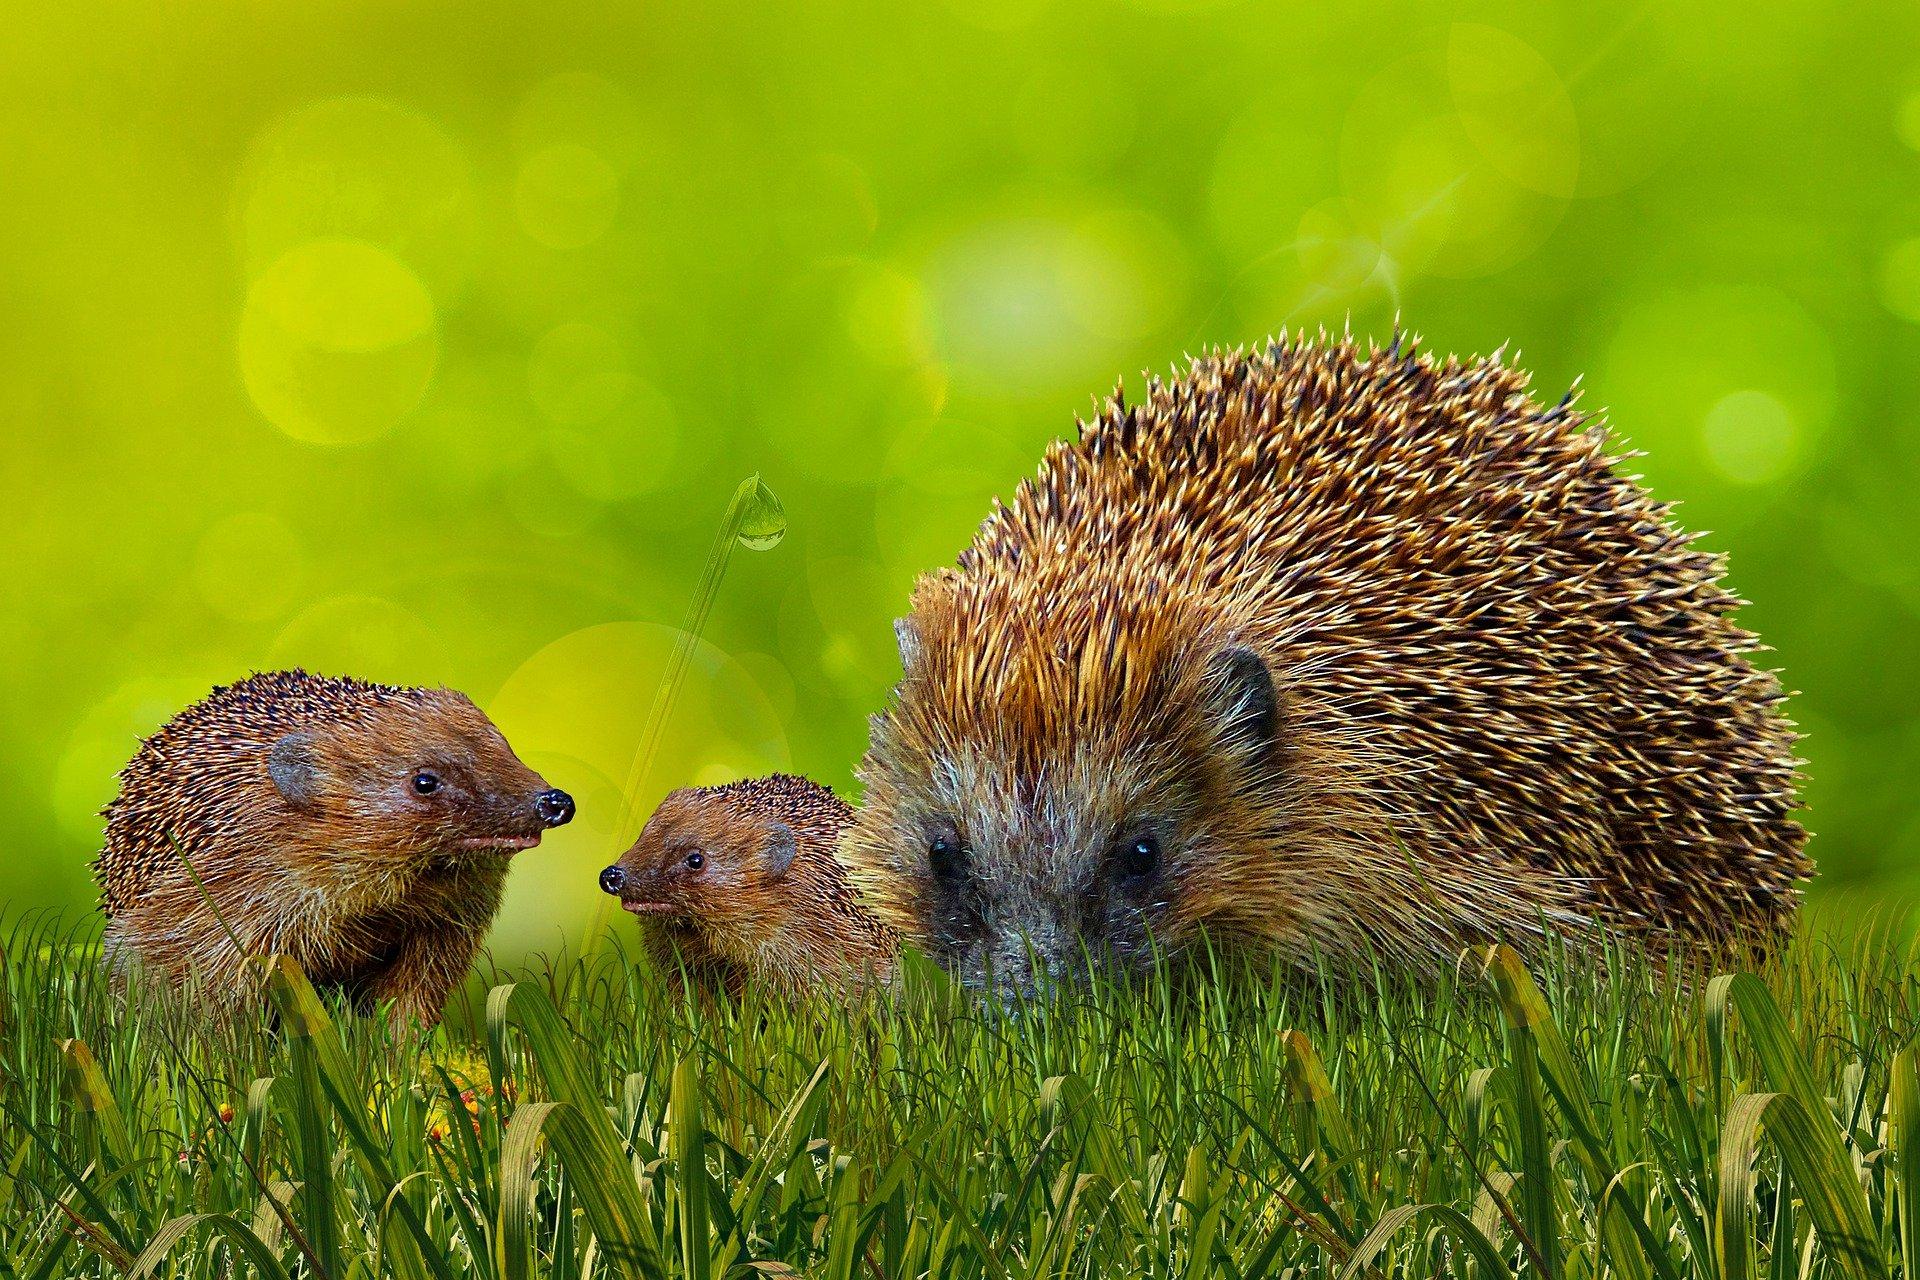 Igel - hedgehog